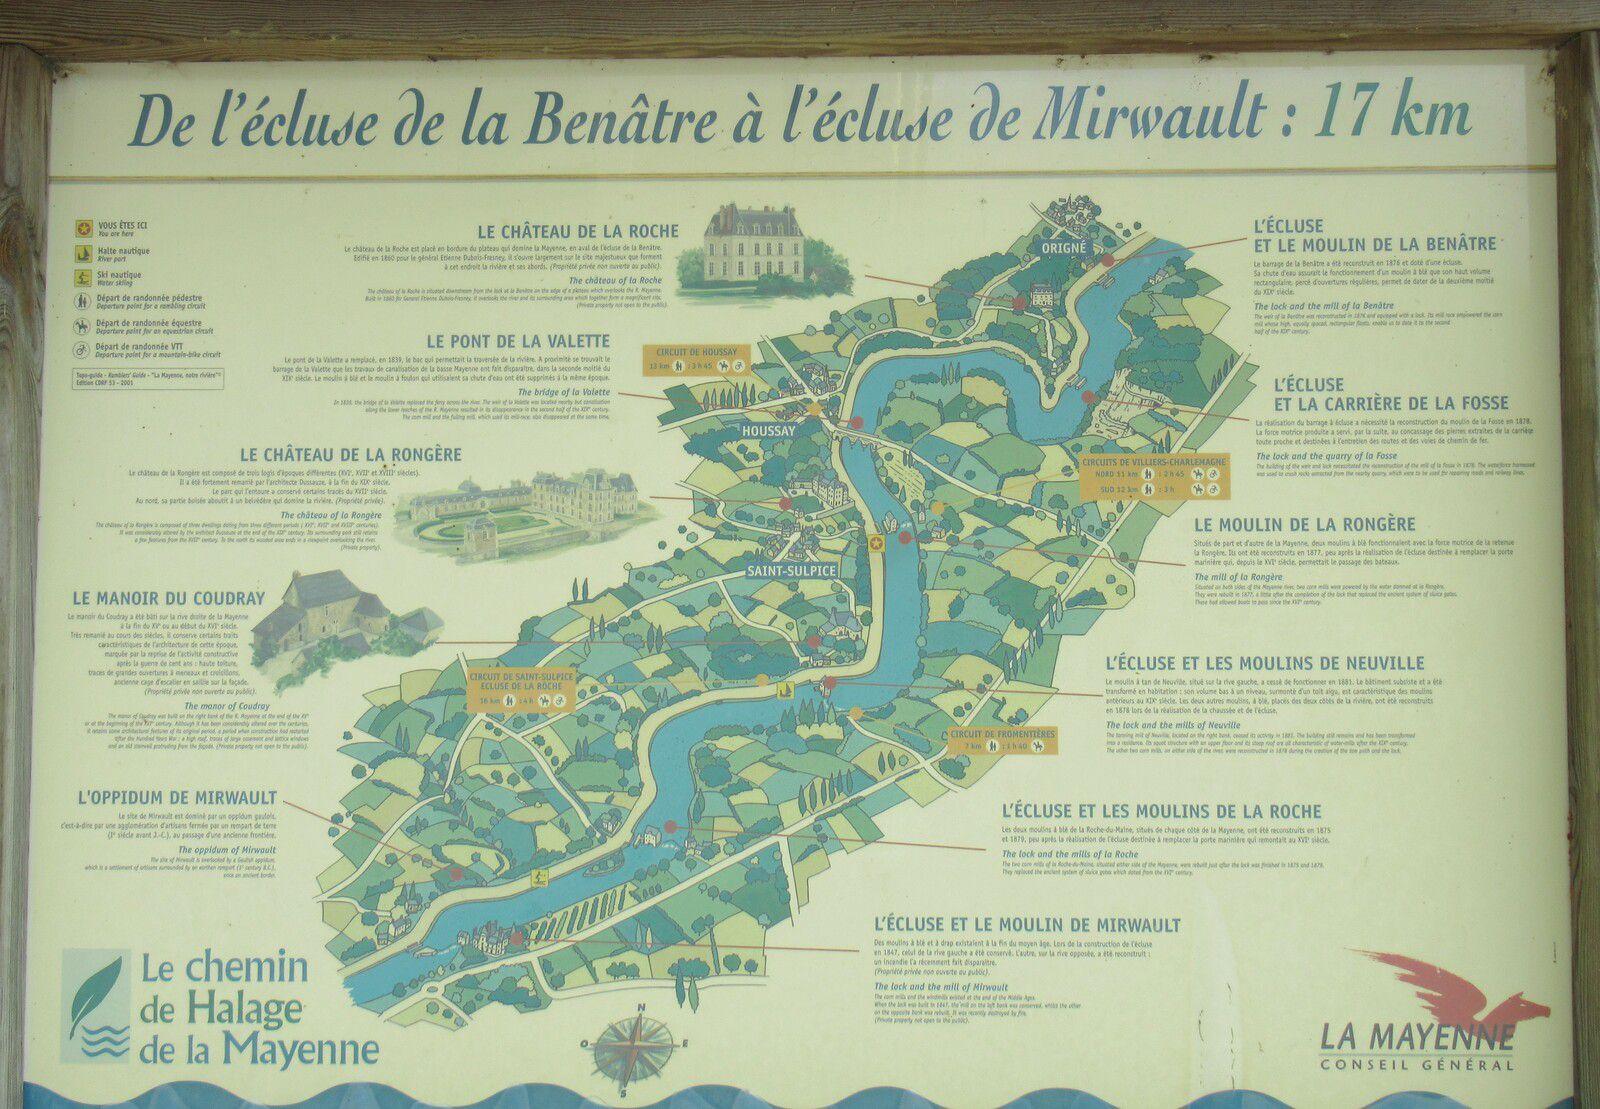 Au fil de la Mayenne - Etape 6 - Origné / Daon - 65,3 km - A.R